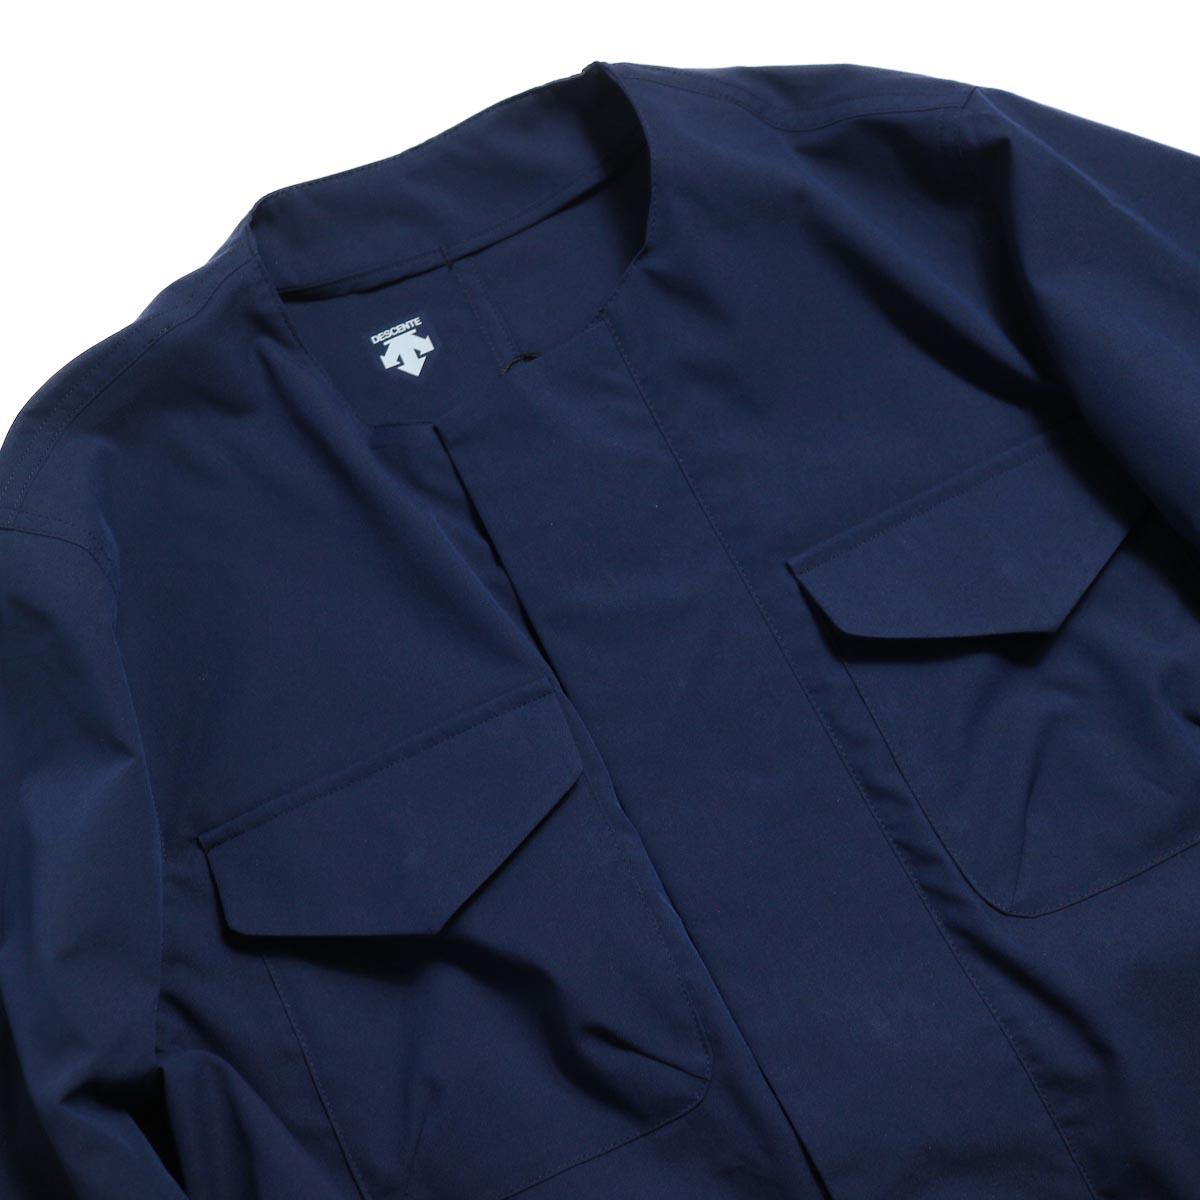 DESCENTE ddd / Utility Jacket -Navy ノーカラー